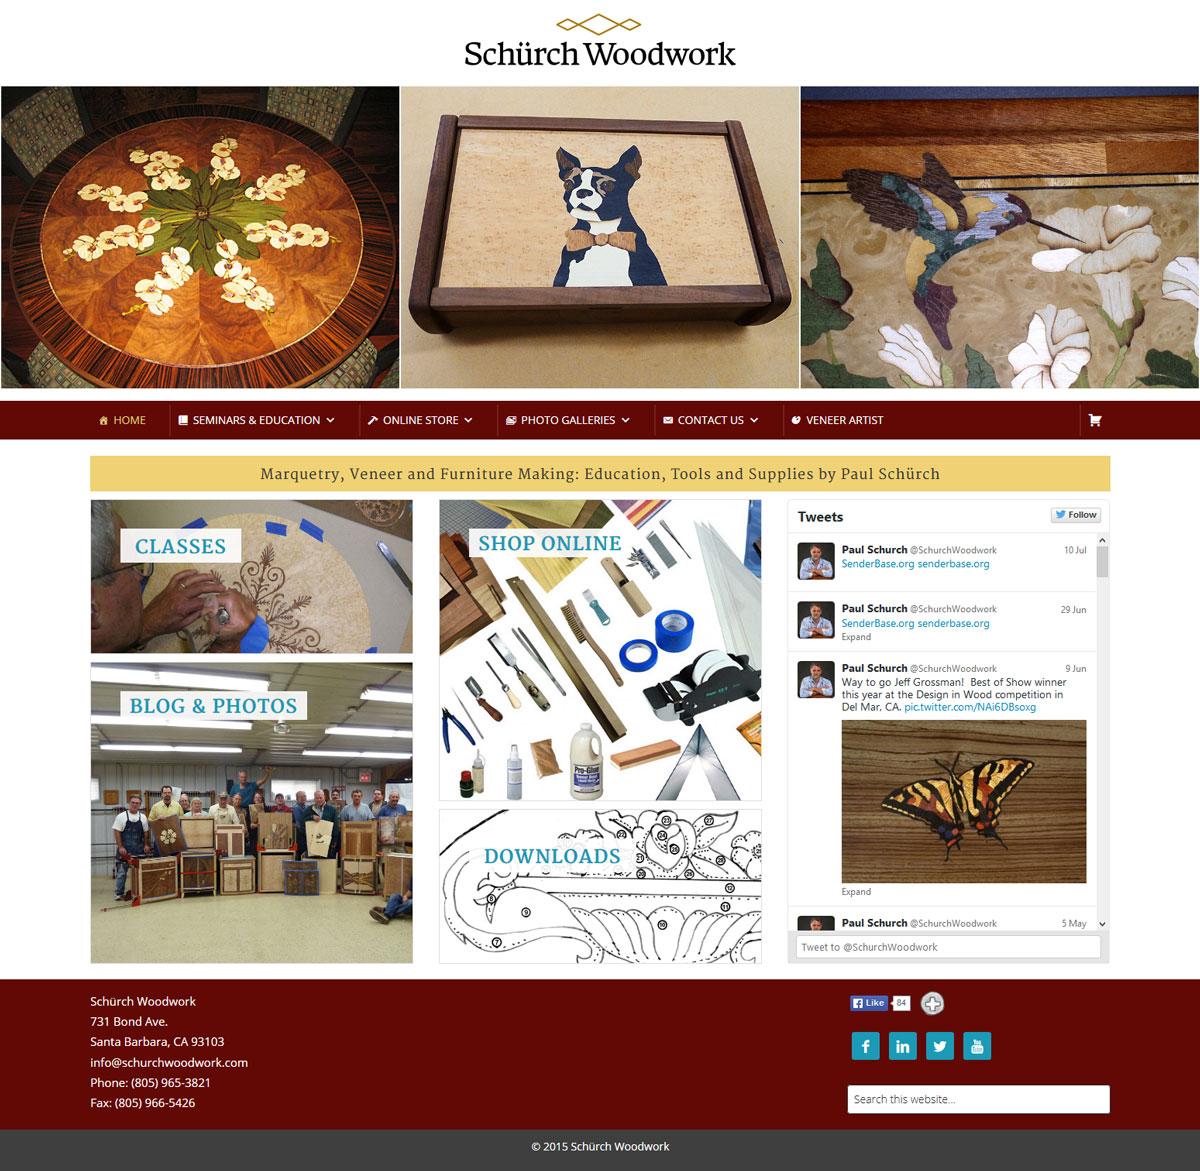 schurchwoodwork.com